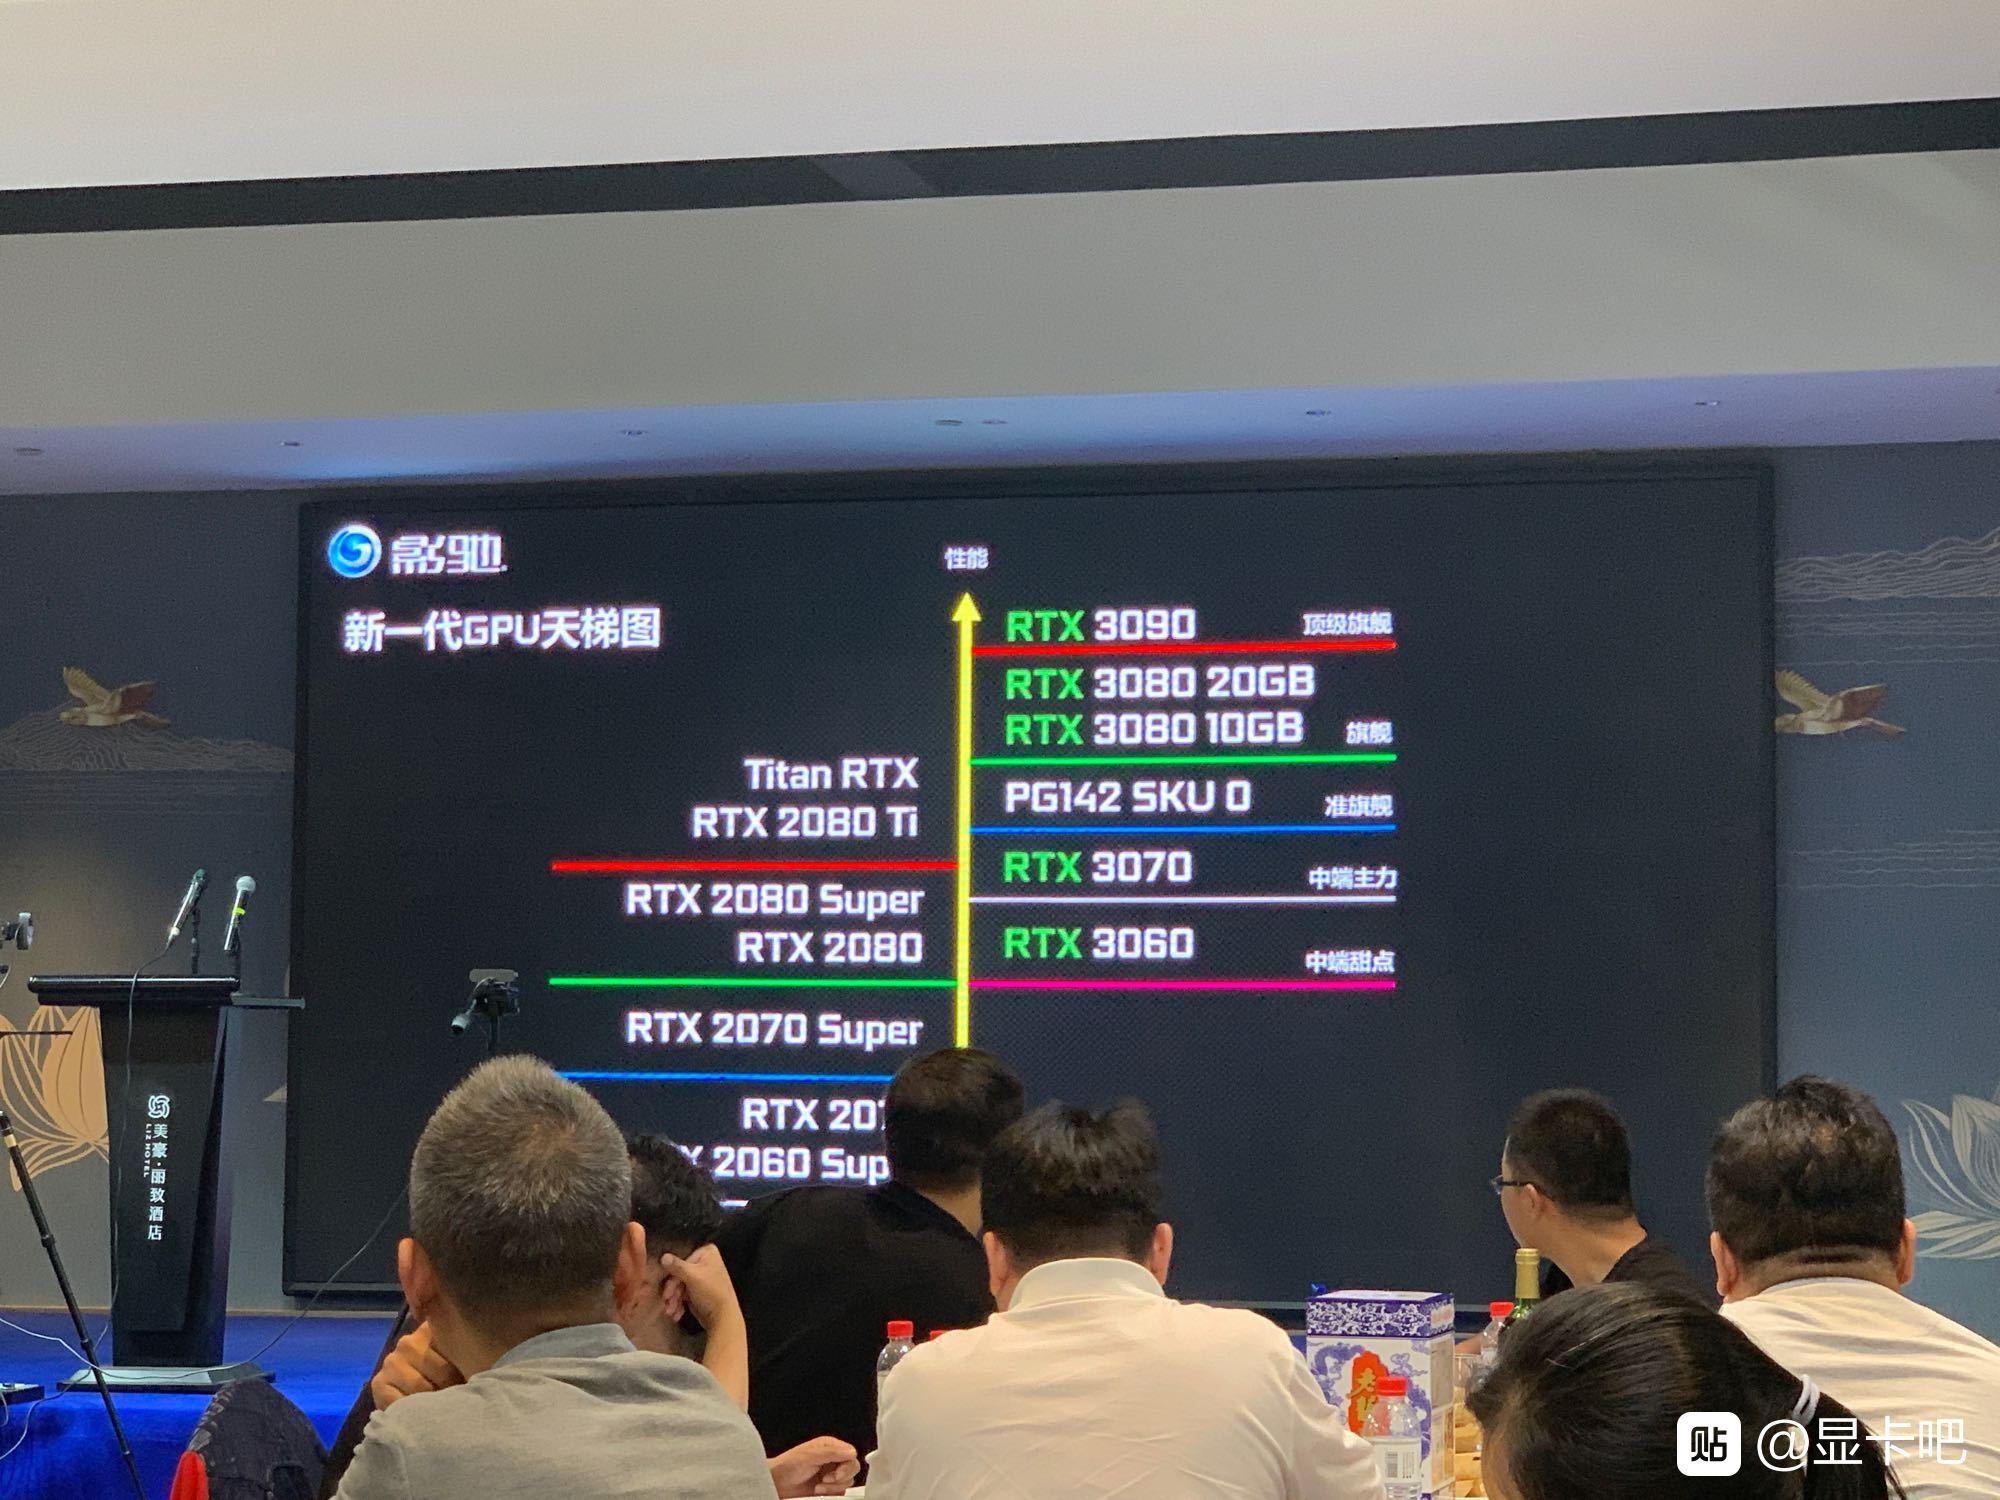 Gigabyte Prepares To Launch 4x Geforce Rtx 3060 Ti With 8gb Gddr6